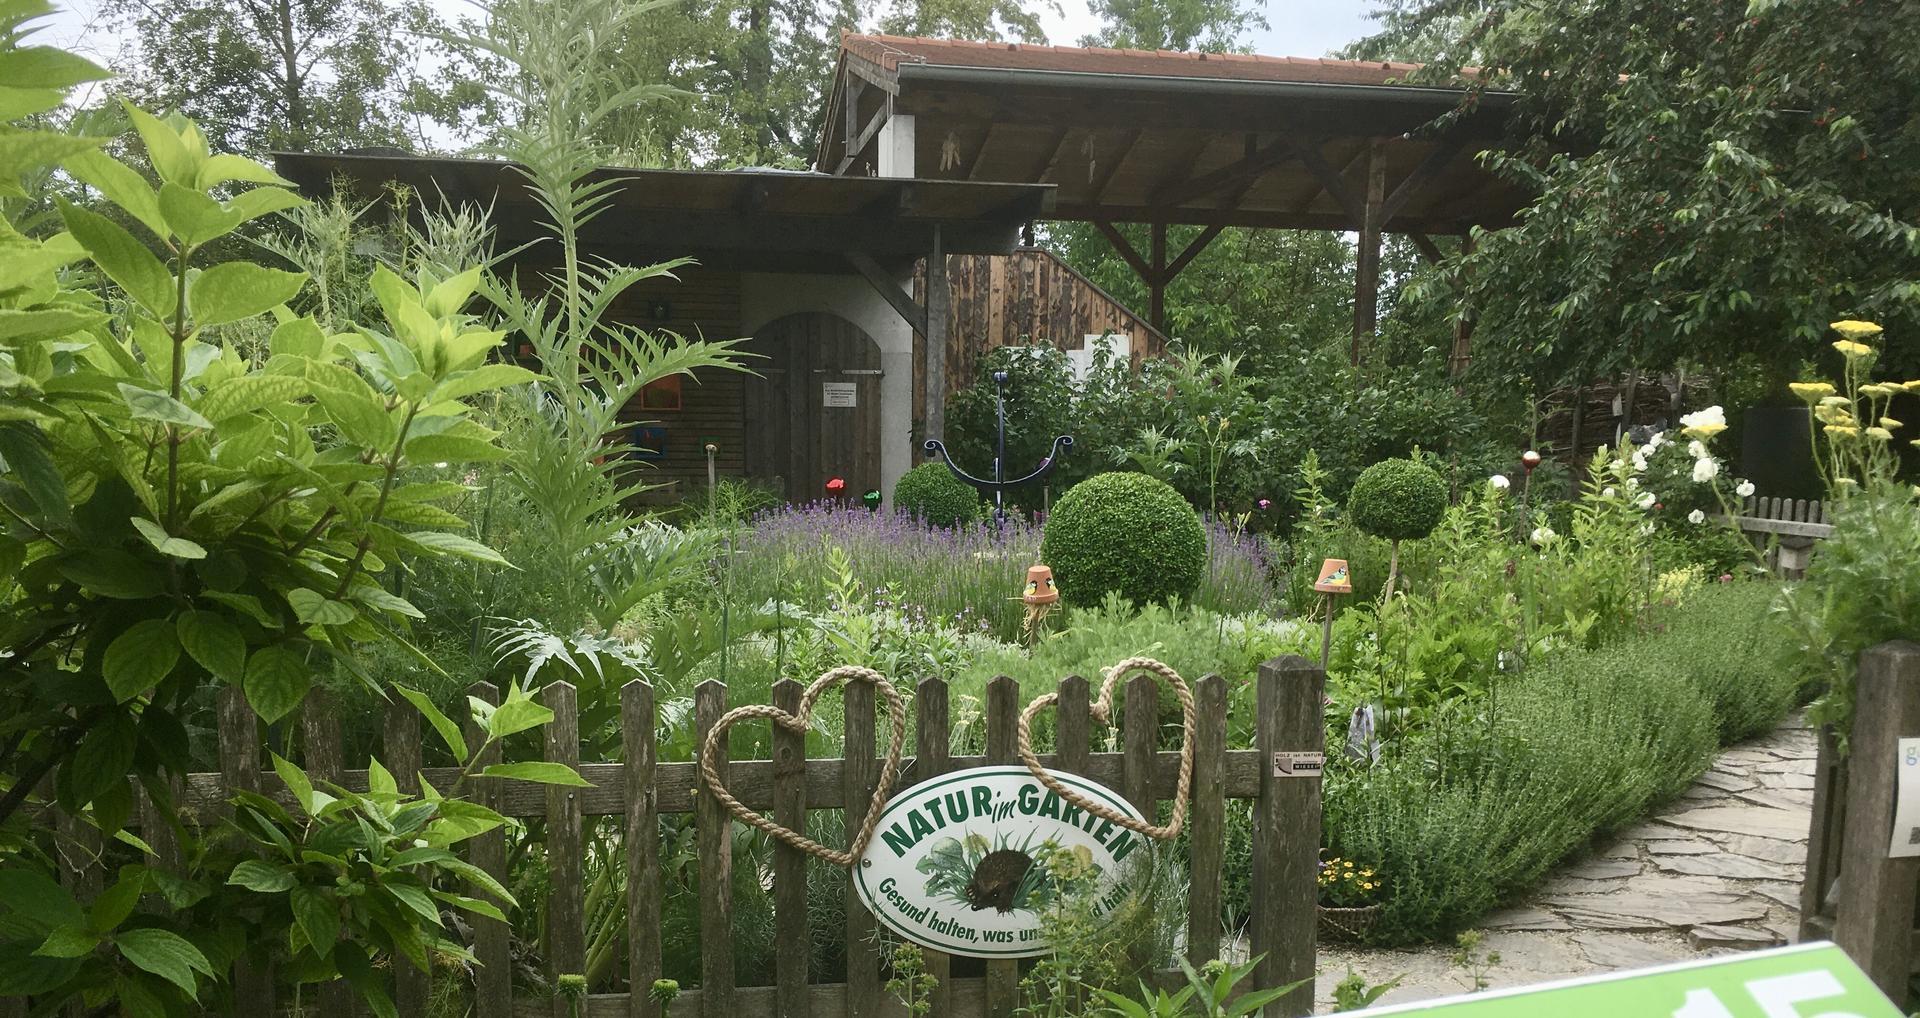 2020 😍 🌞 - Na vylete za inspiraci v zahradach v Tullnu (Rakousko)